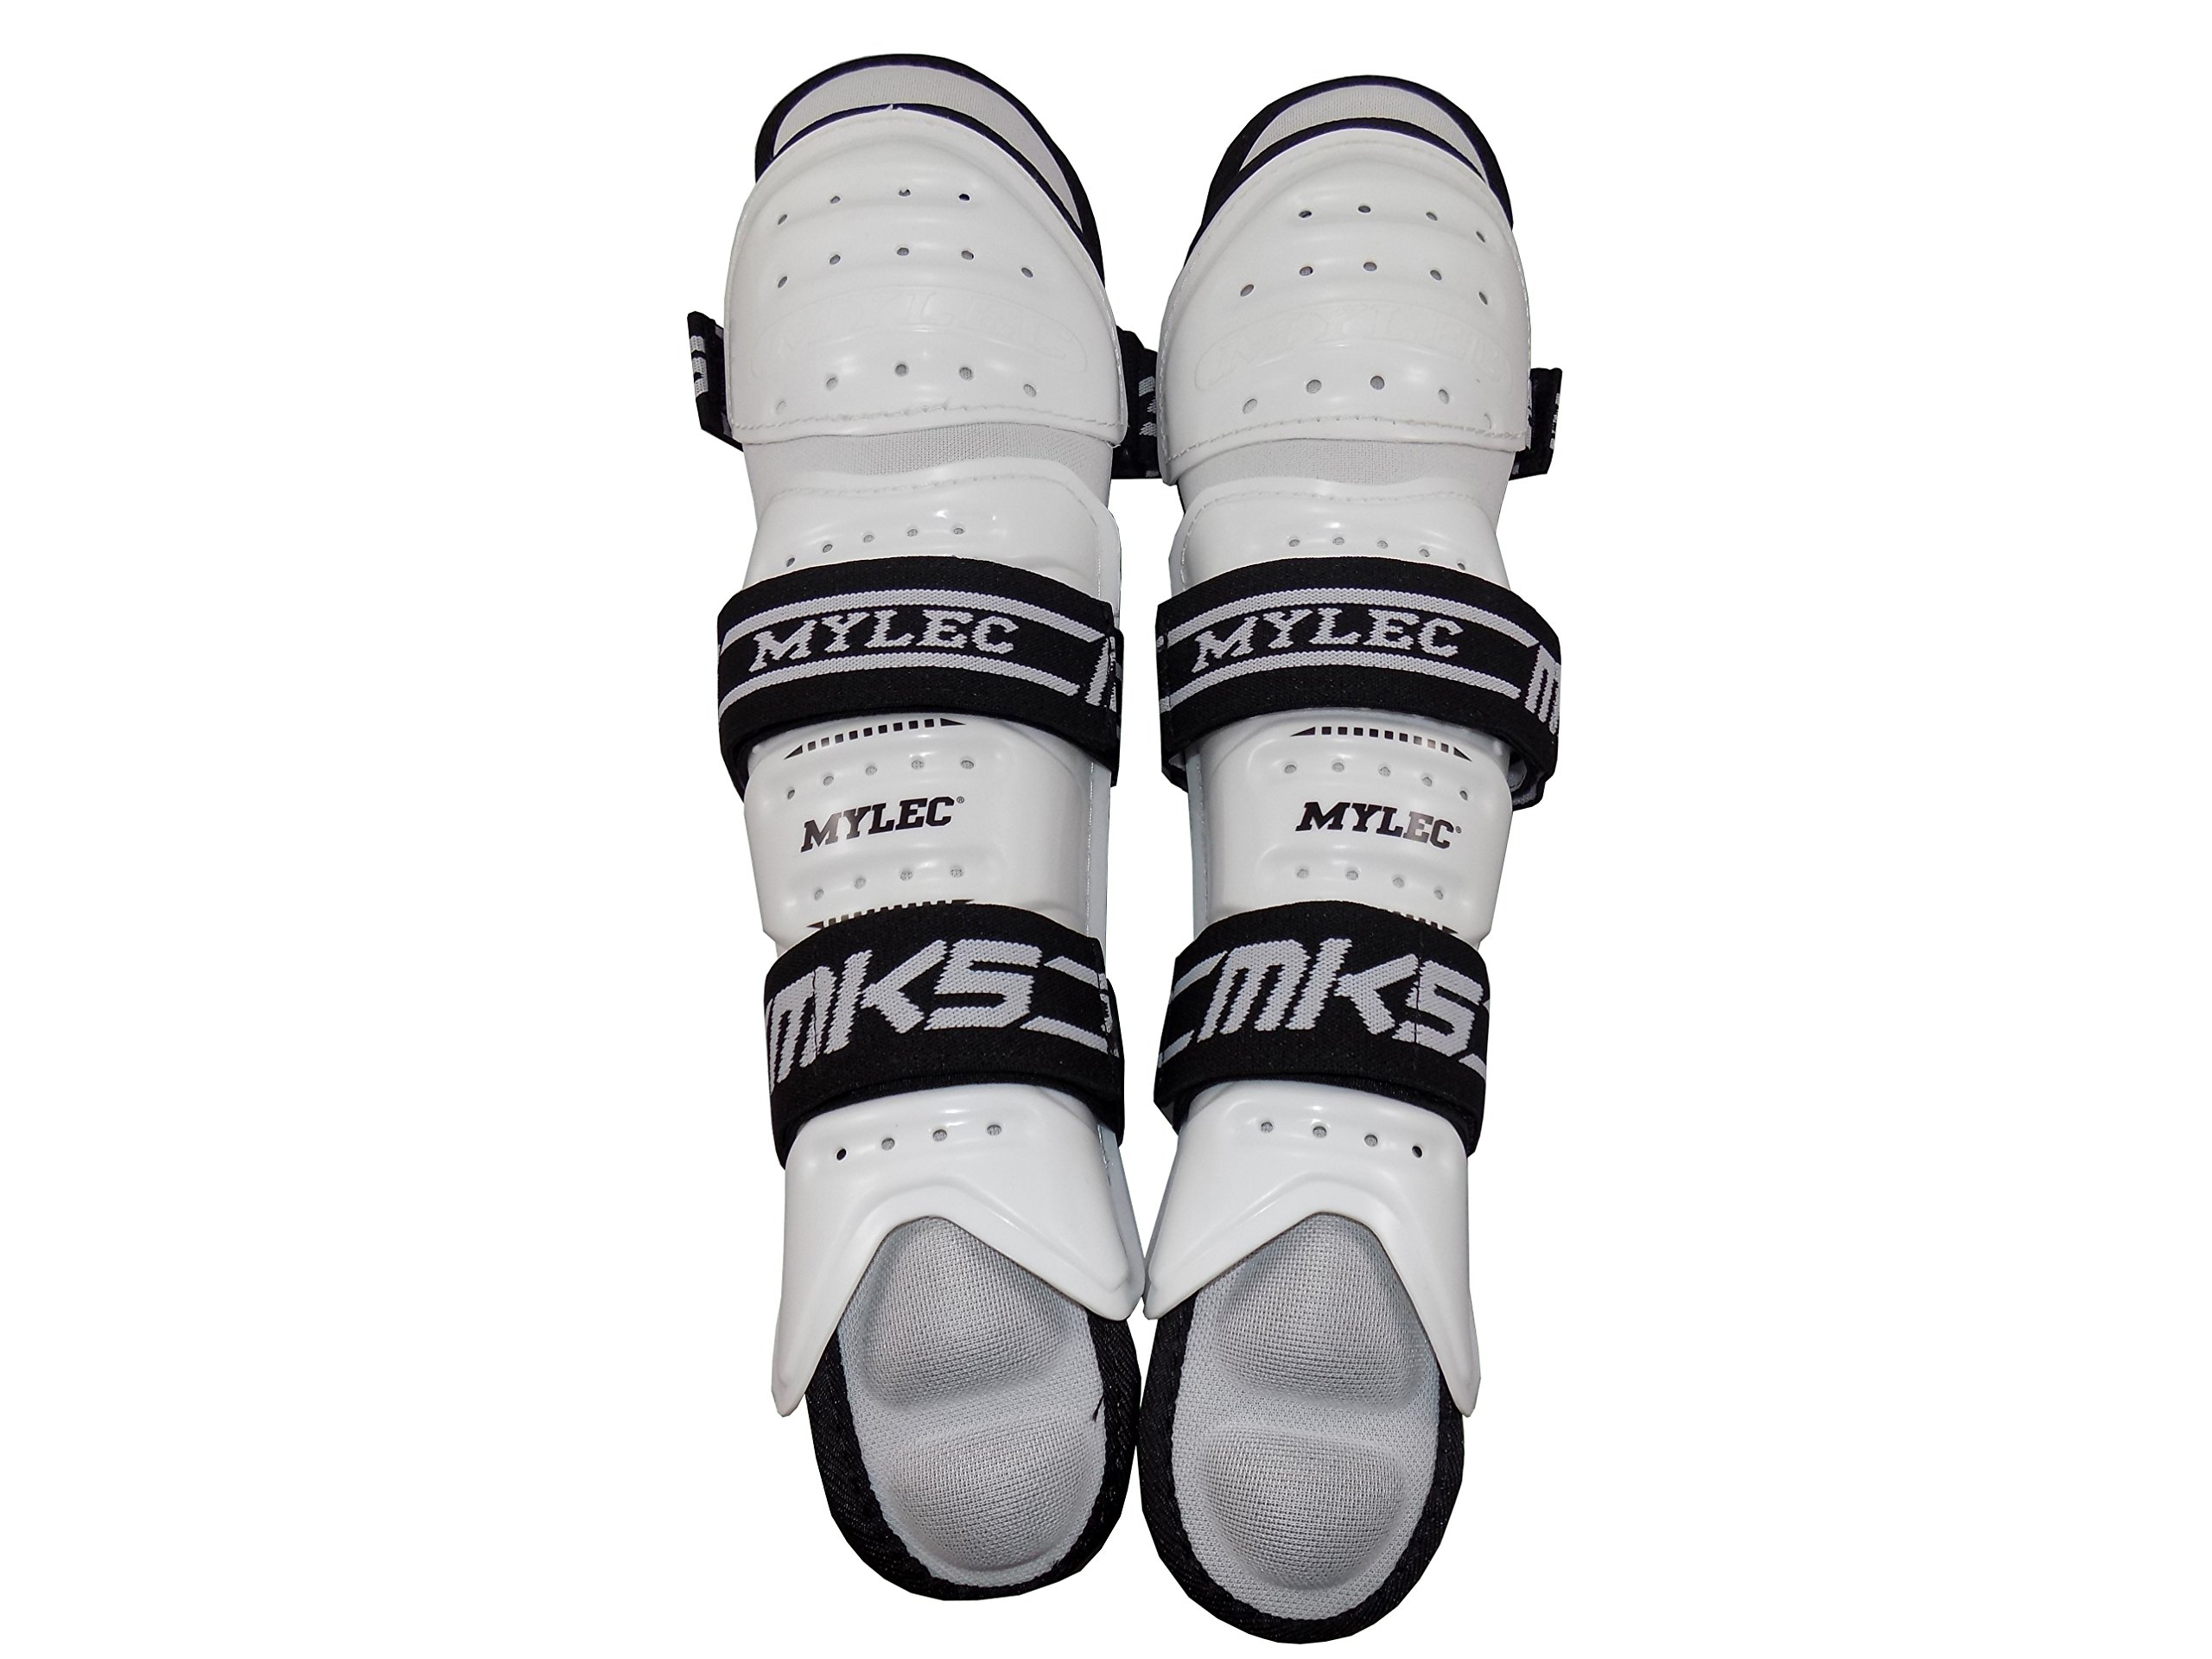 Mylec MK5 Shin Pad, 9'', White